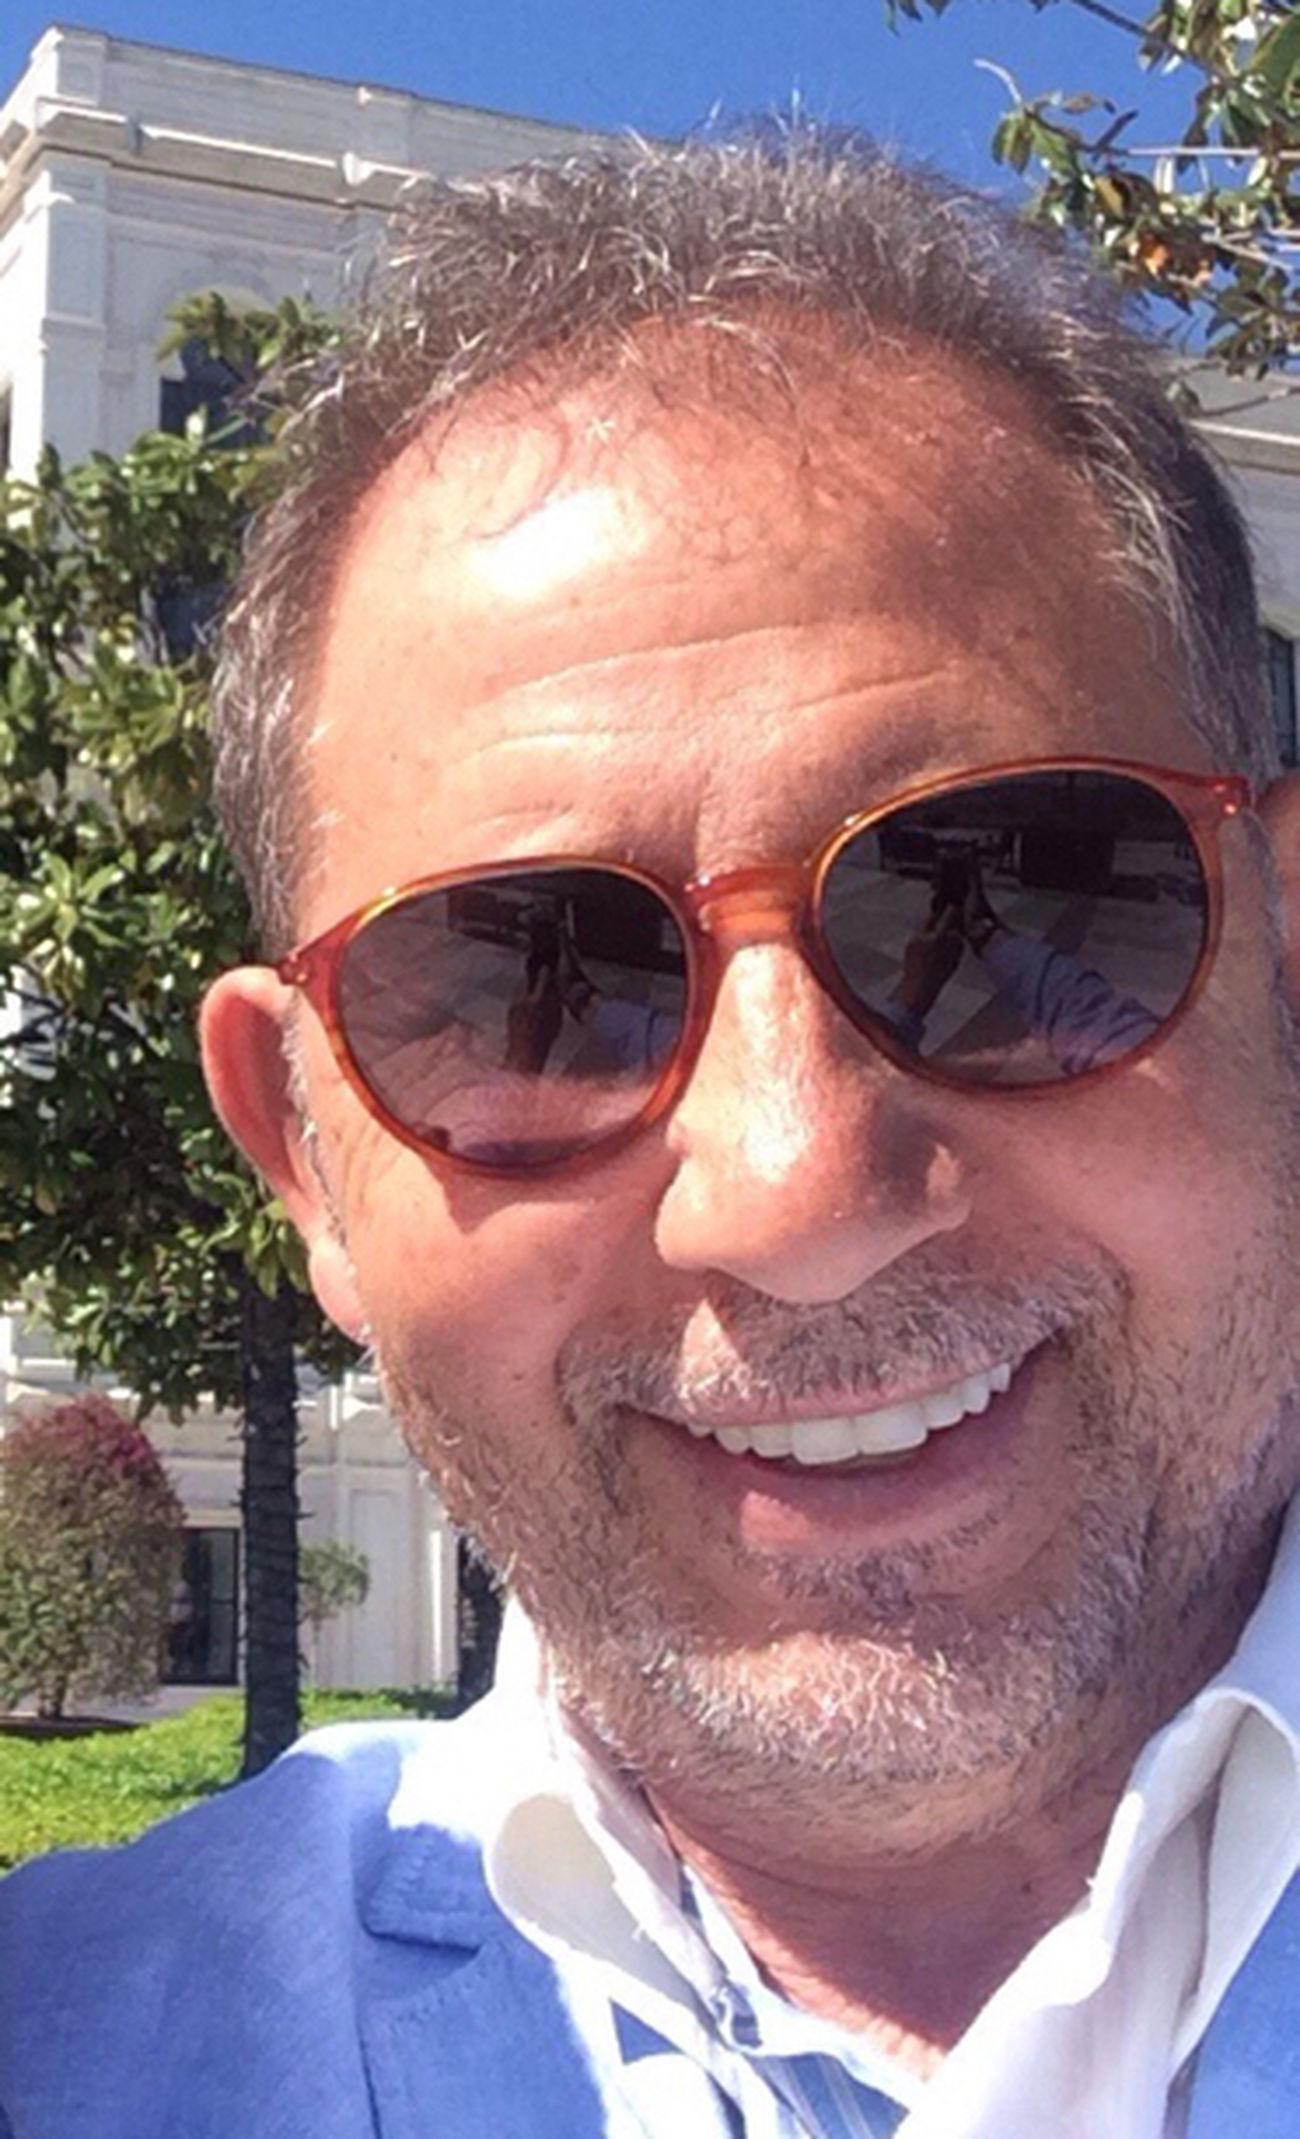 That's Me ThatsMe Smile❤ Smile ✌ Hello World Portrait Selfie Selfportrait Istanbul Yesilköy EyeEmBestPics